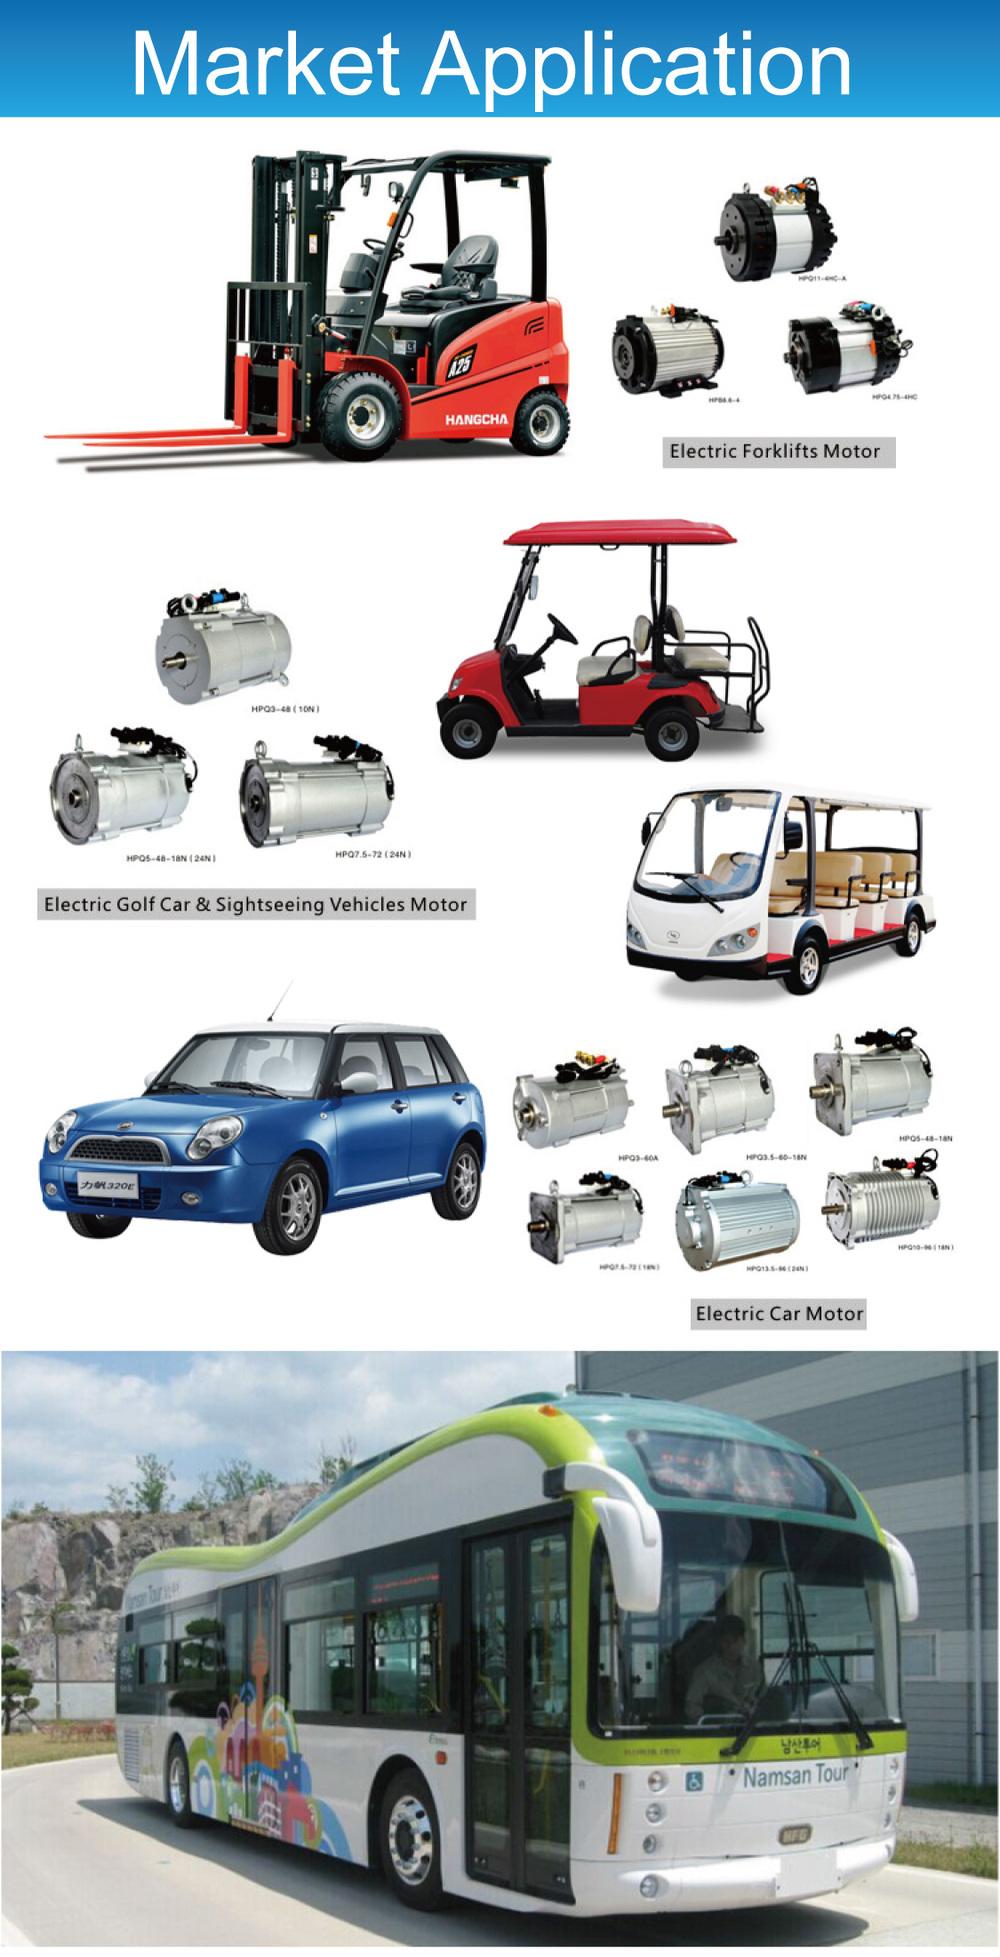 Hpq5 48 18n 5kw Small Electric Generator Motor Low Rpm Buy Motor